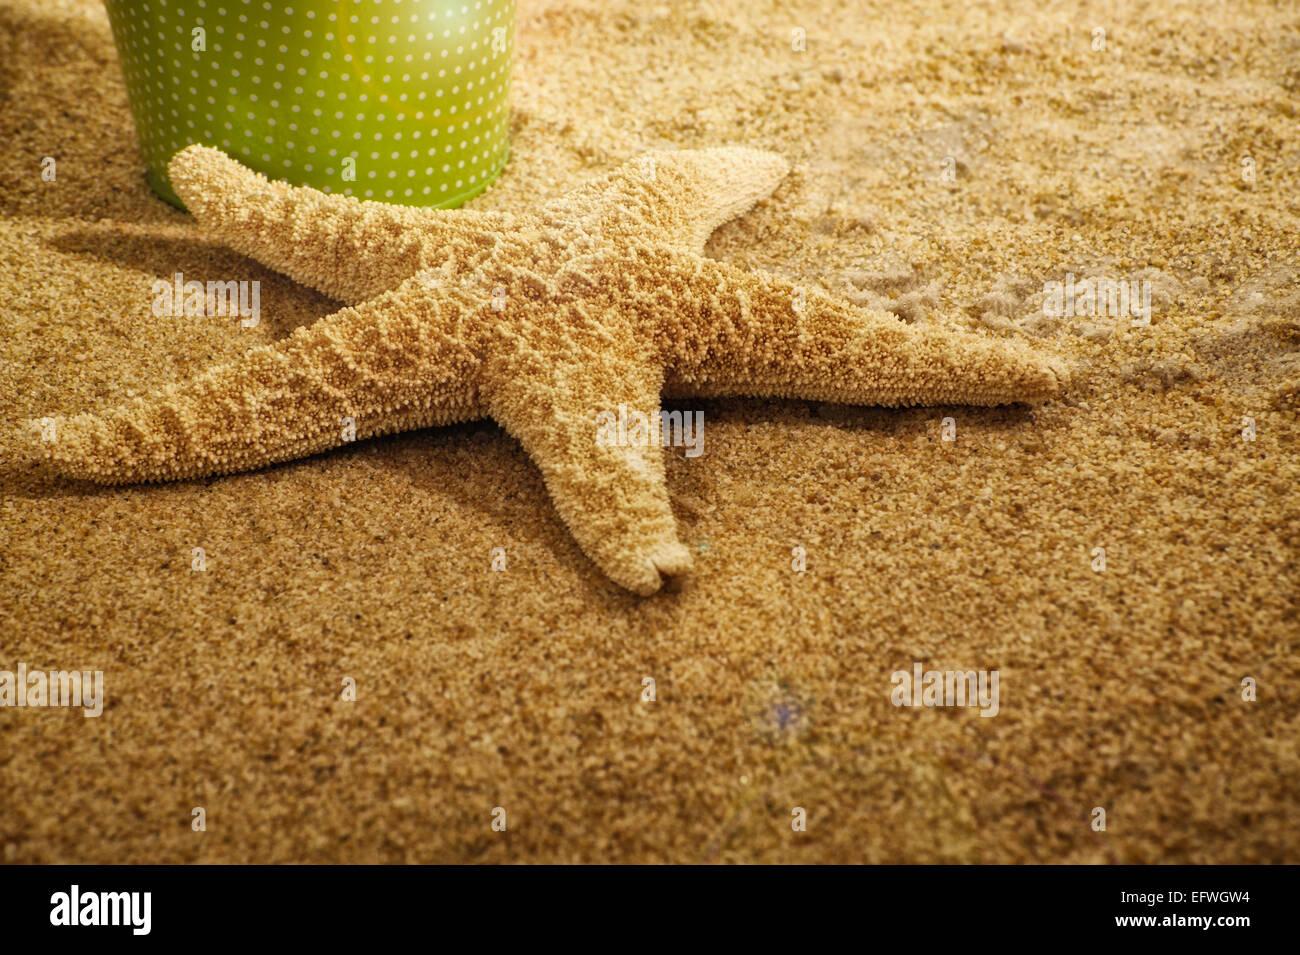 vintage-green-tin-bucket-white-polka-dots-sandy-beach-sea-star-starfish-EFWGW4.jpg